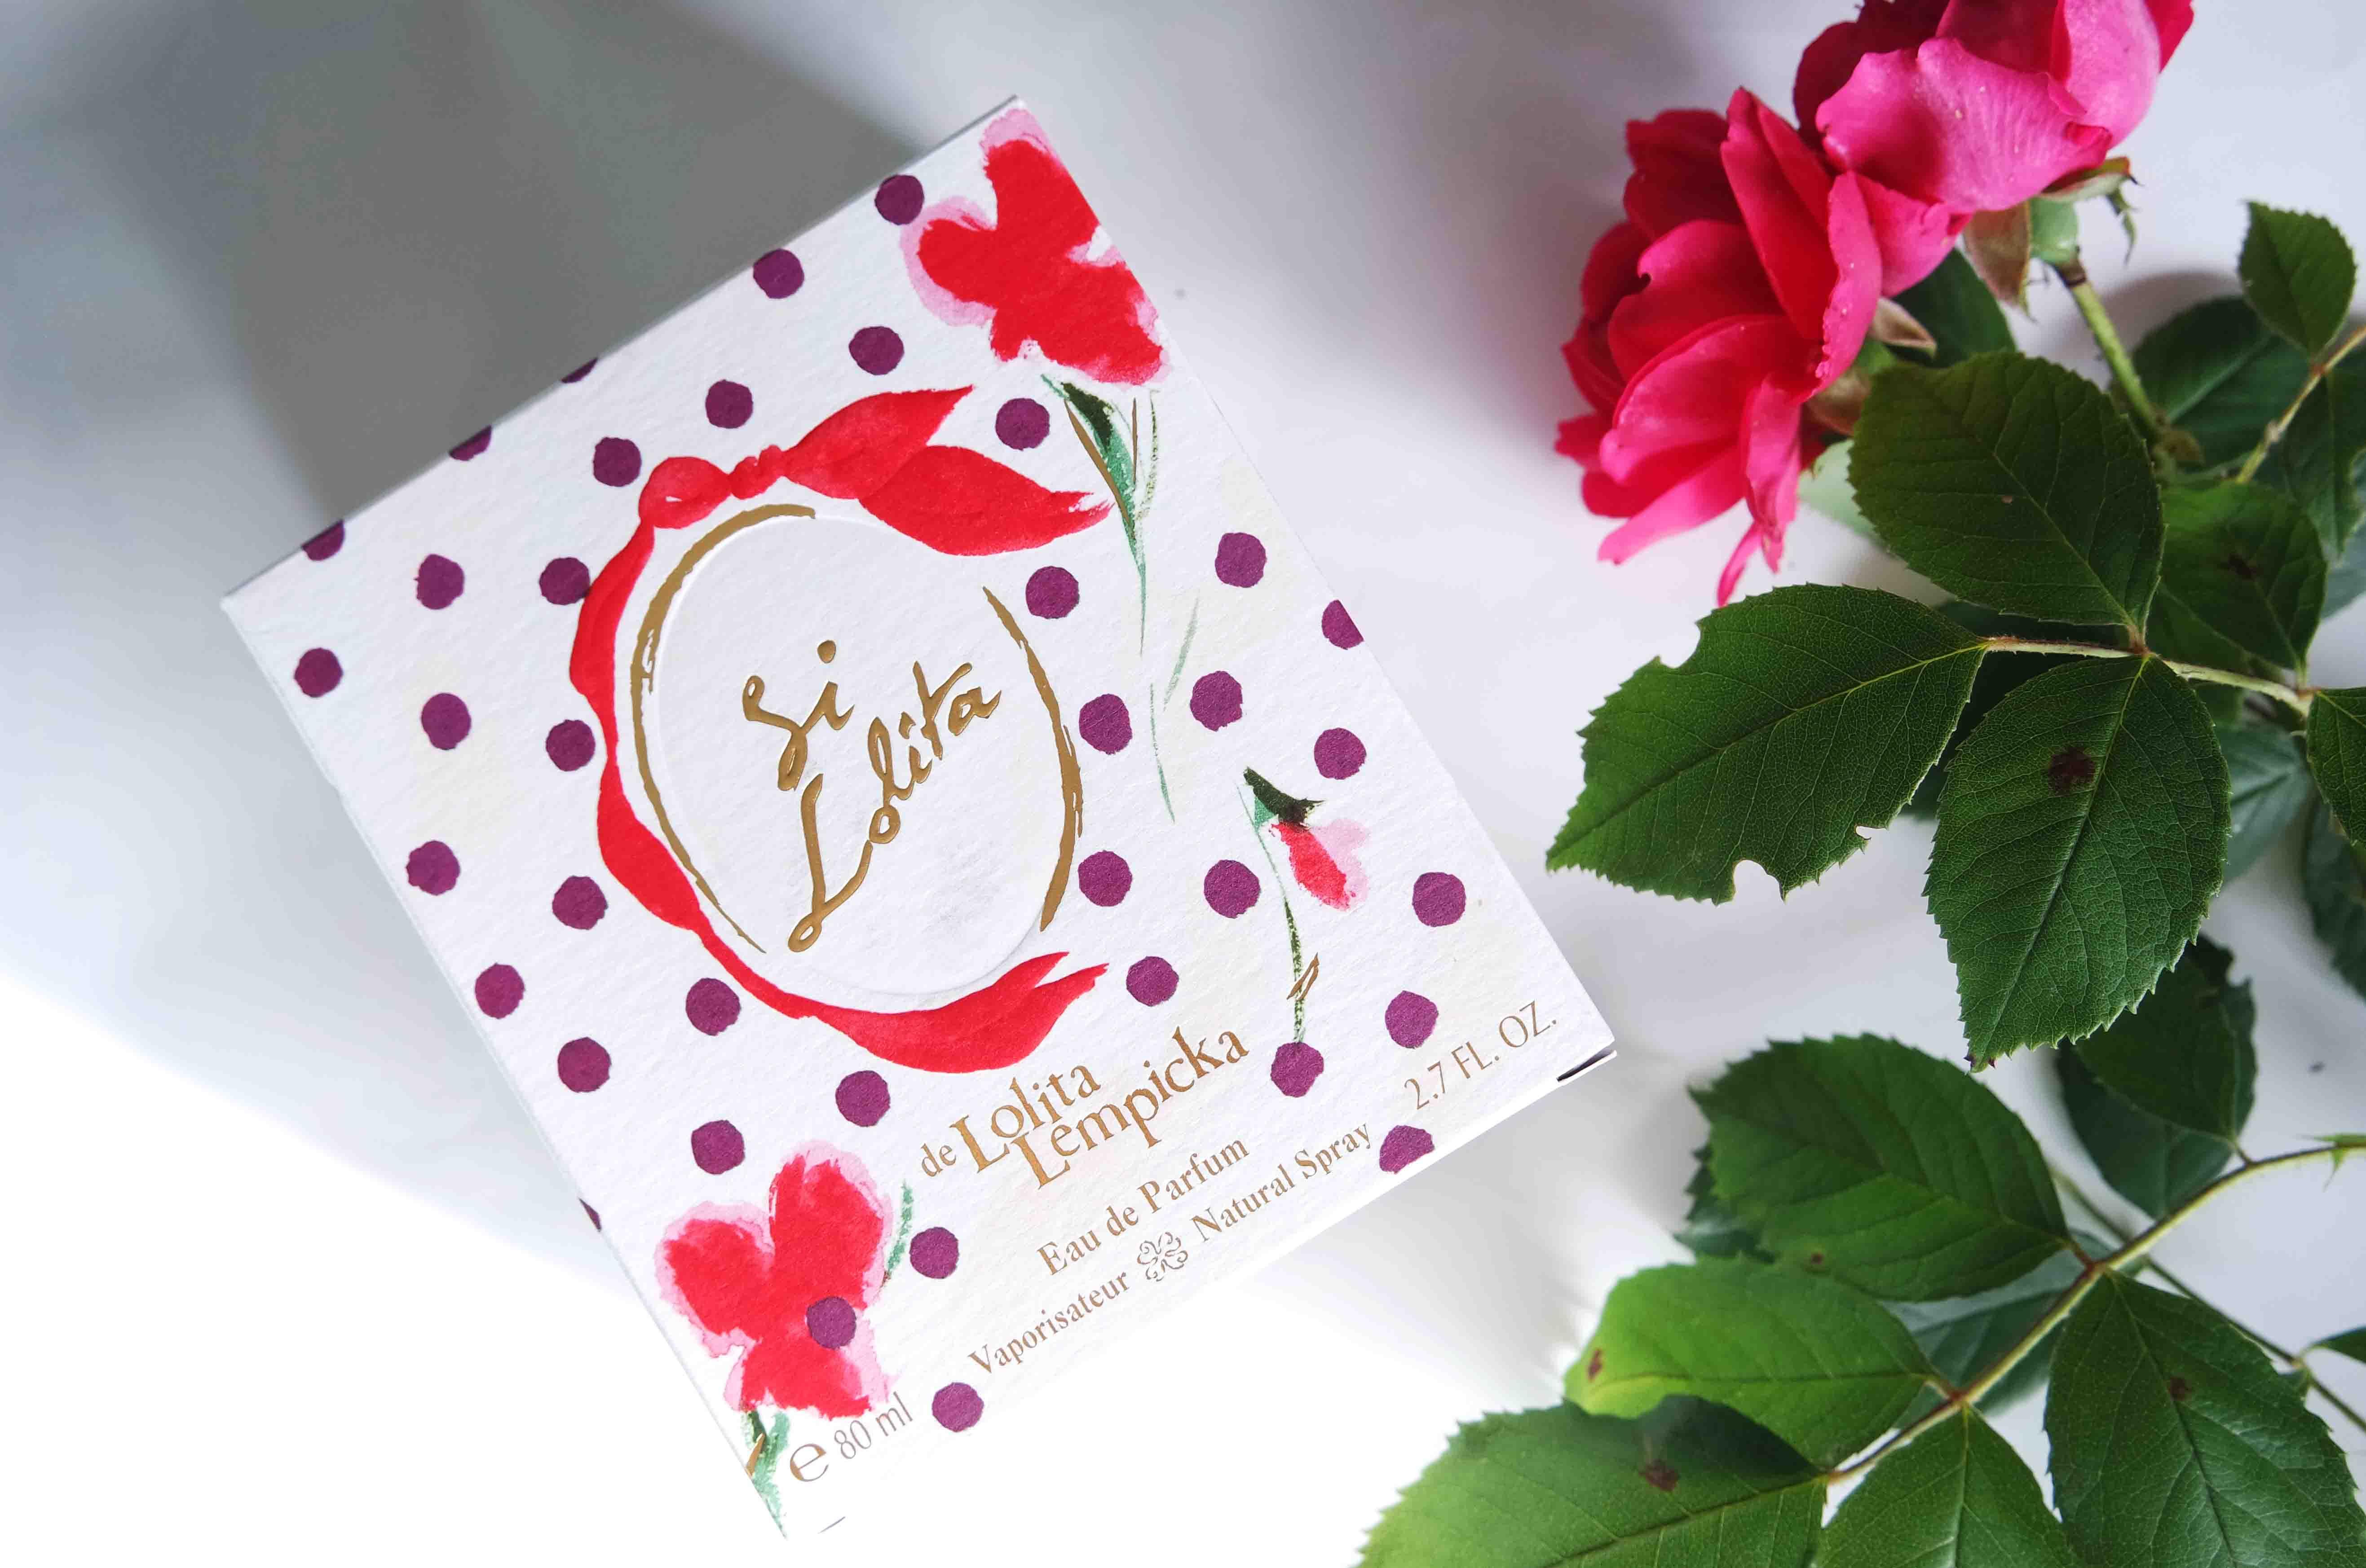 Verpakking Si Lolita van Lolita Lempicka